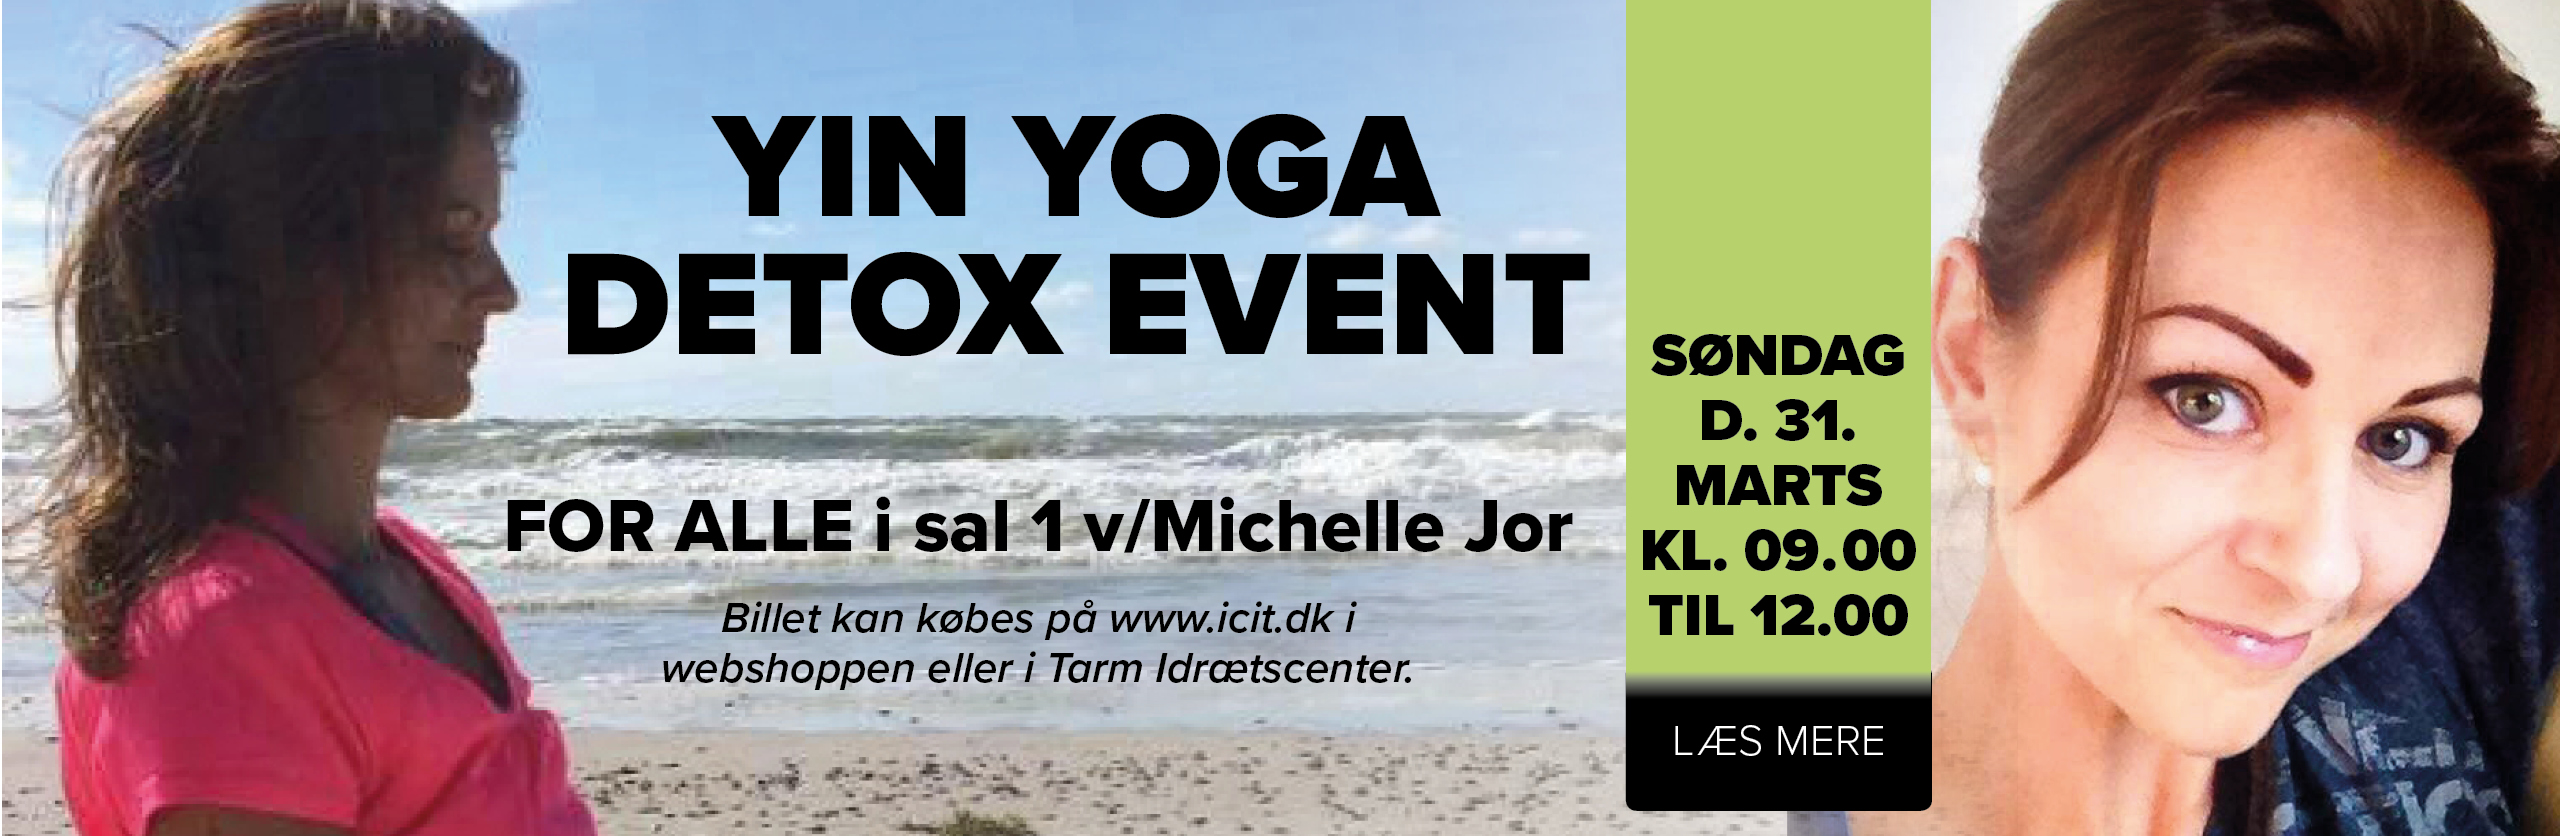 Yin Yoga Detox Event